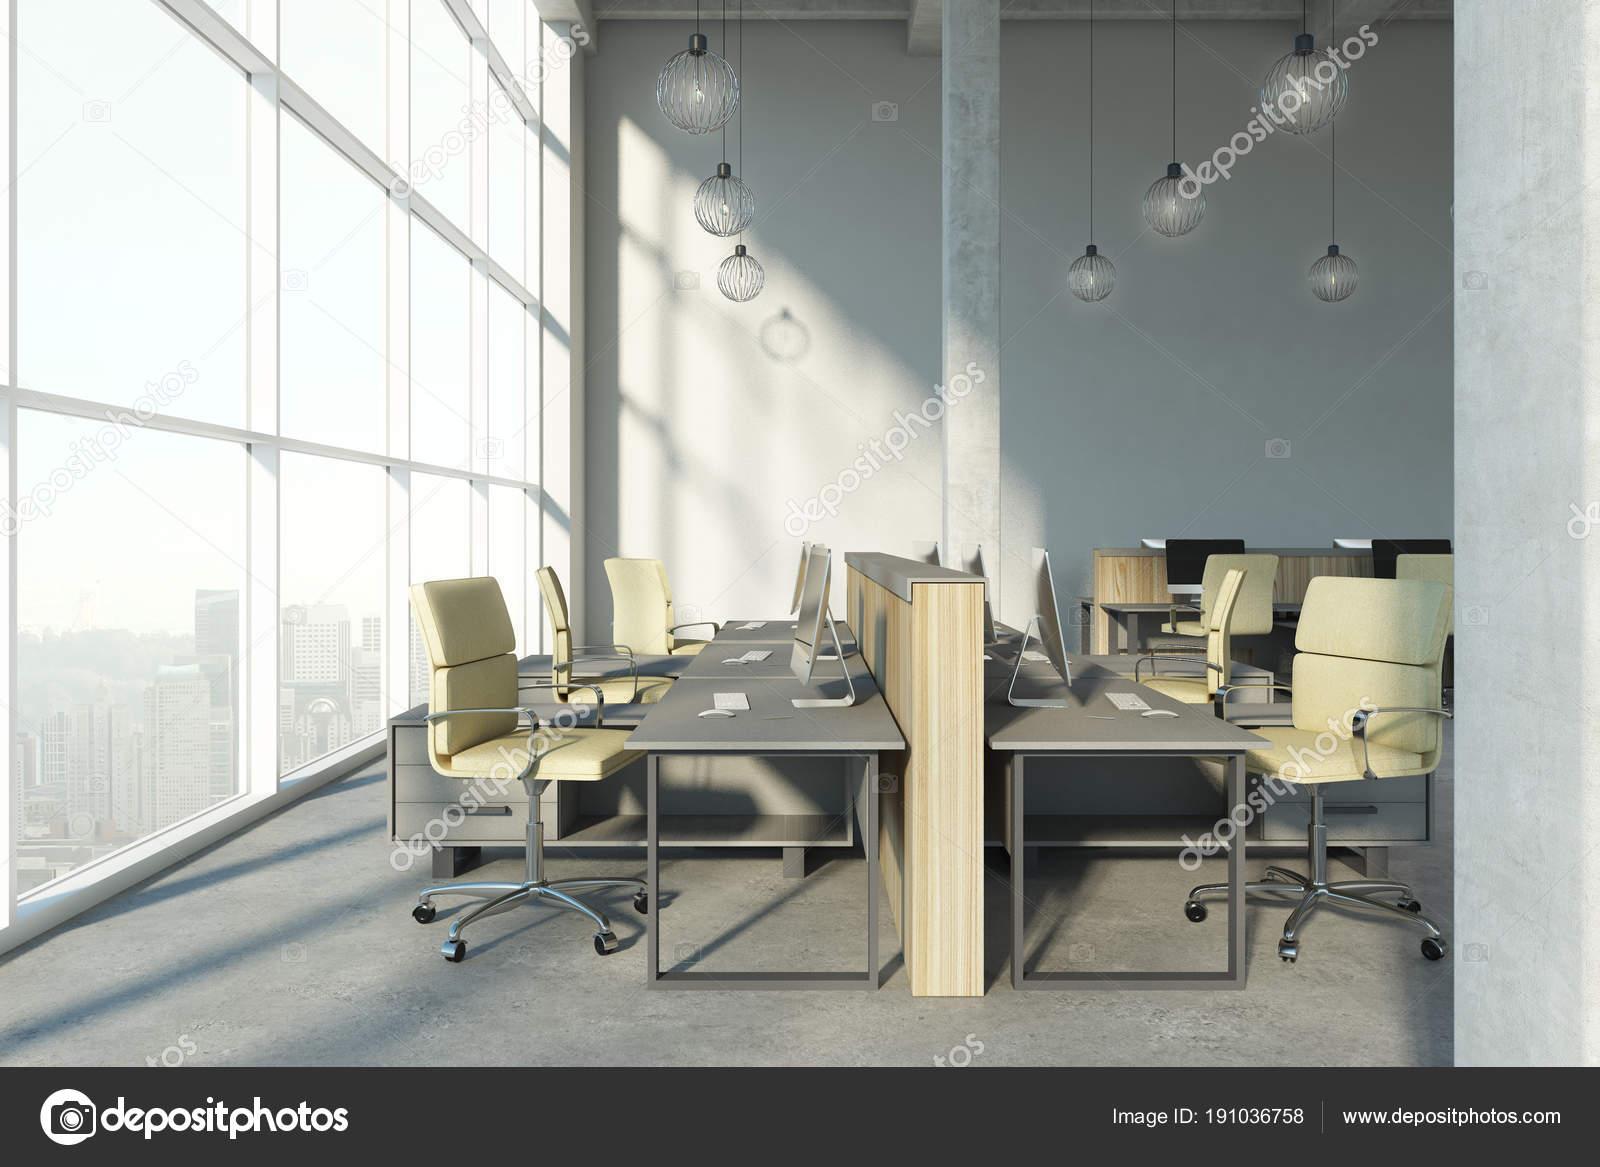 Beton In Interieur : Moderne beton coworking interieur u stockfoto peshkova